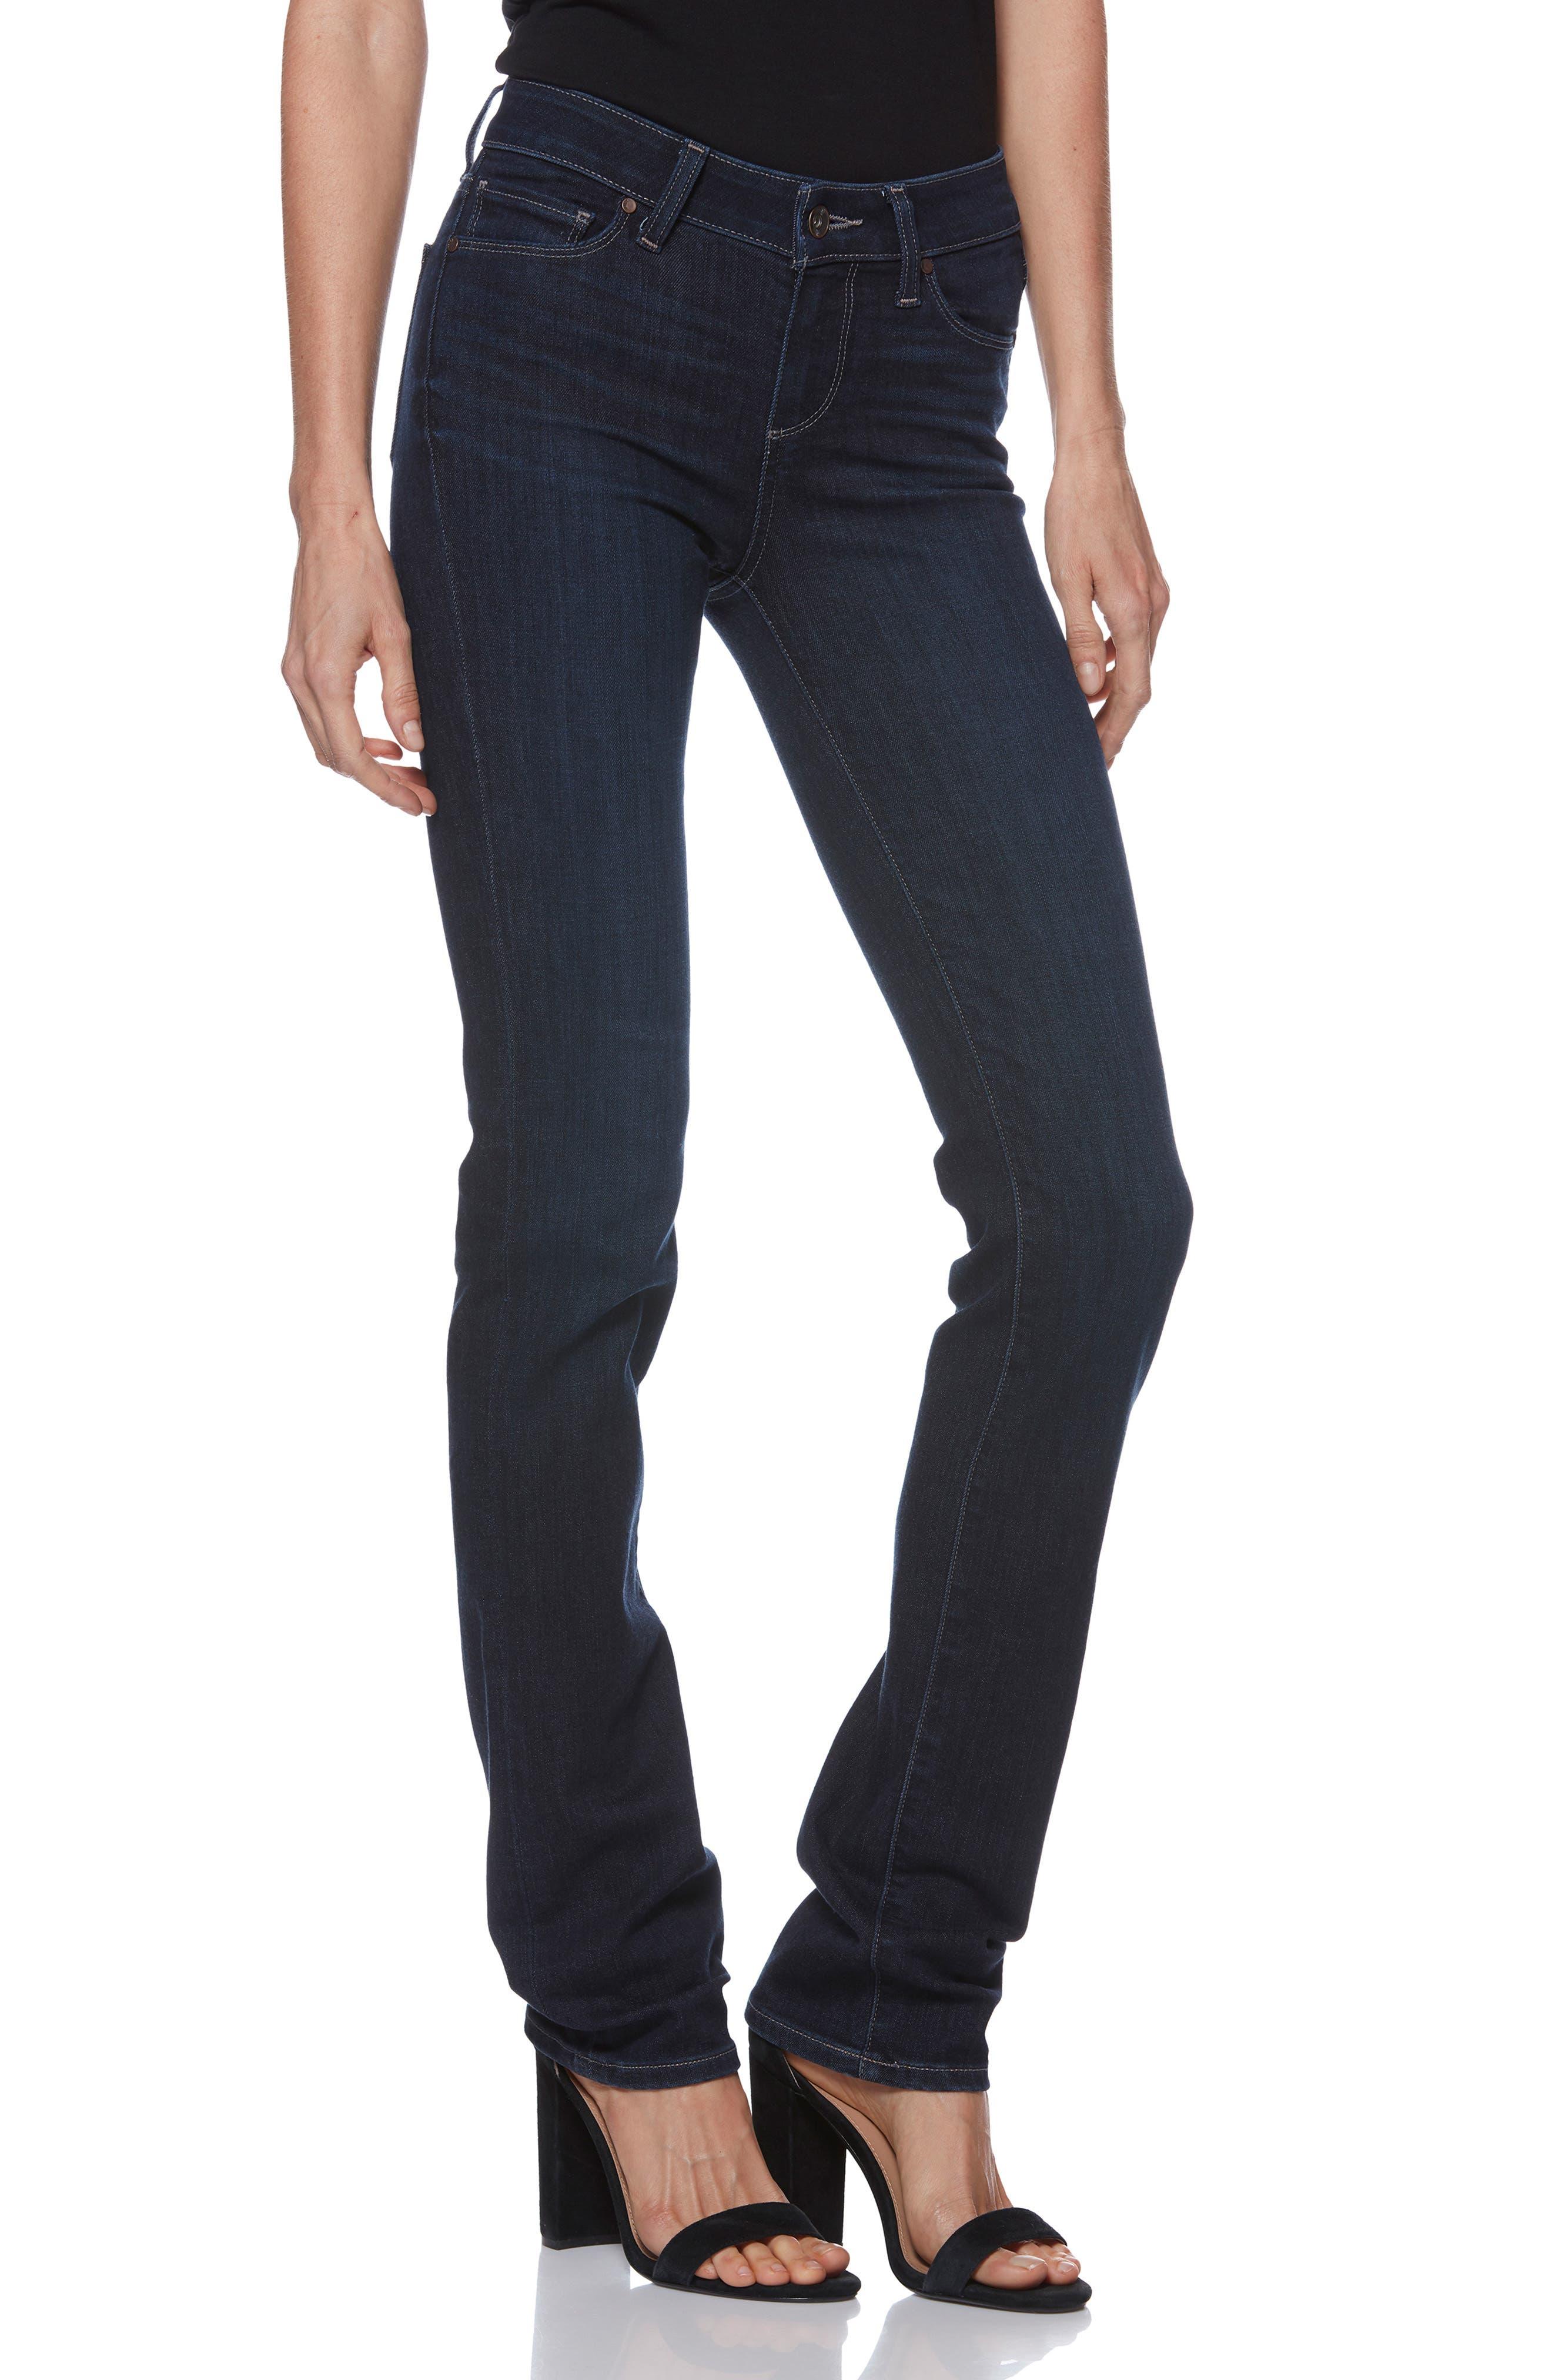 Skyline Straight Leg Jeans,                             Main thumbnail 1, color,                             DALY